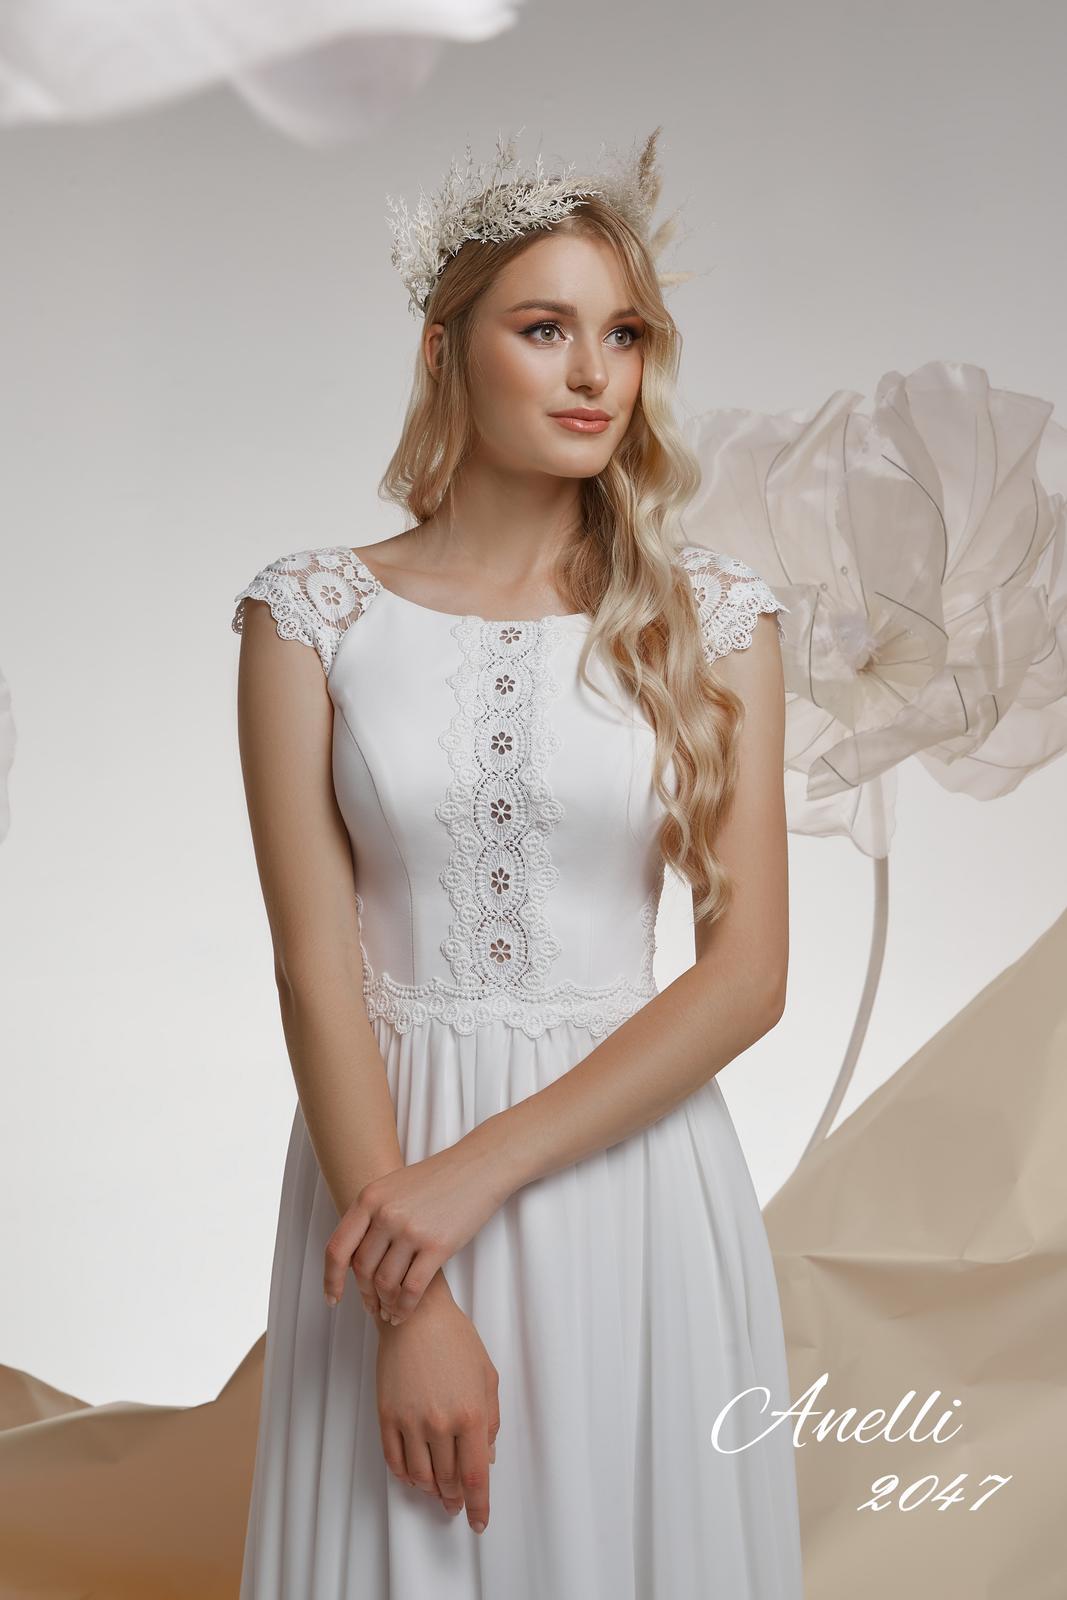 Svadobné šaty - Imagine 2047 - Obrázok č. 2